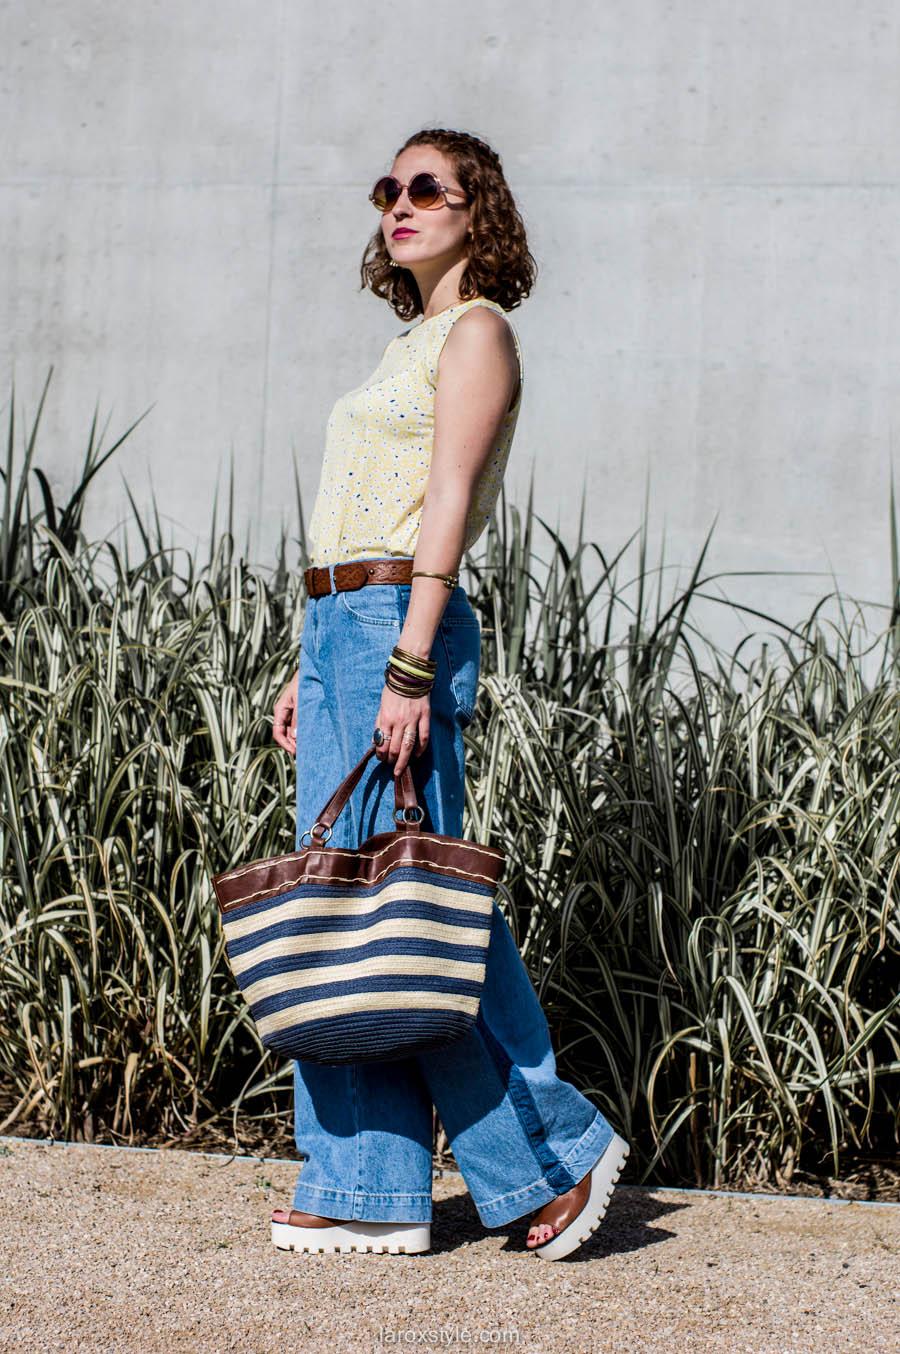 laroxstyle - blog mode lyon - look 70s - pantalon patte d elephant (13 sur 44)